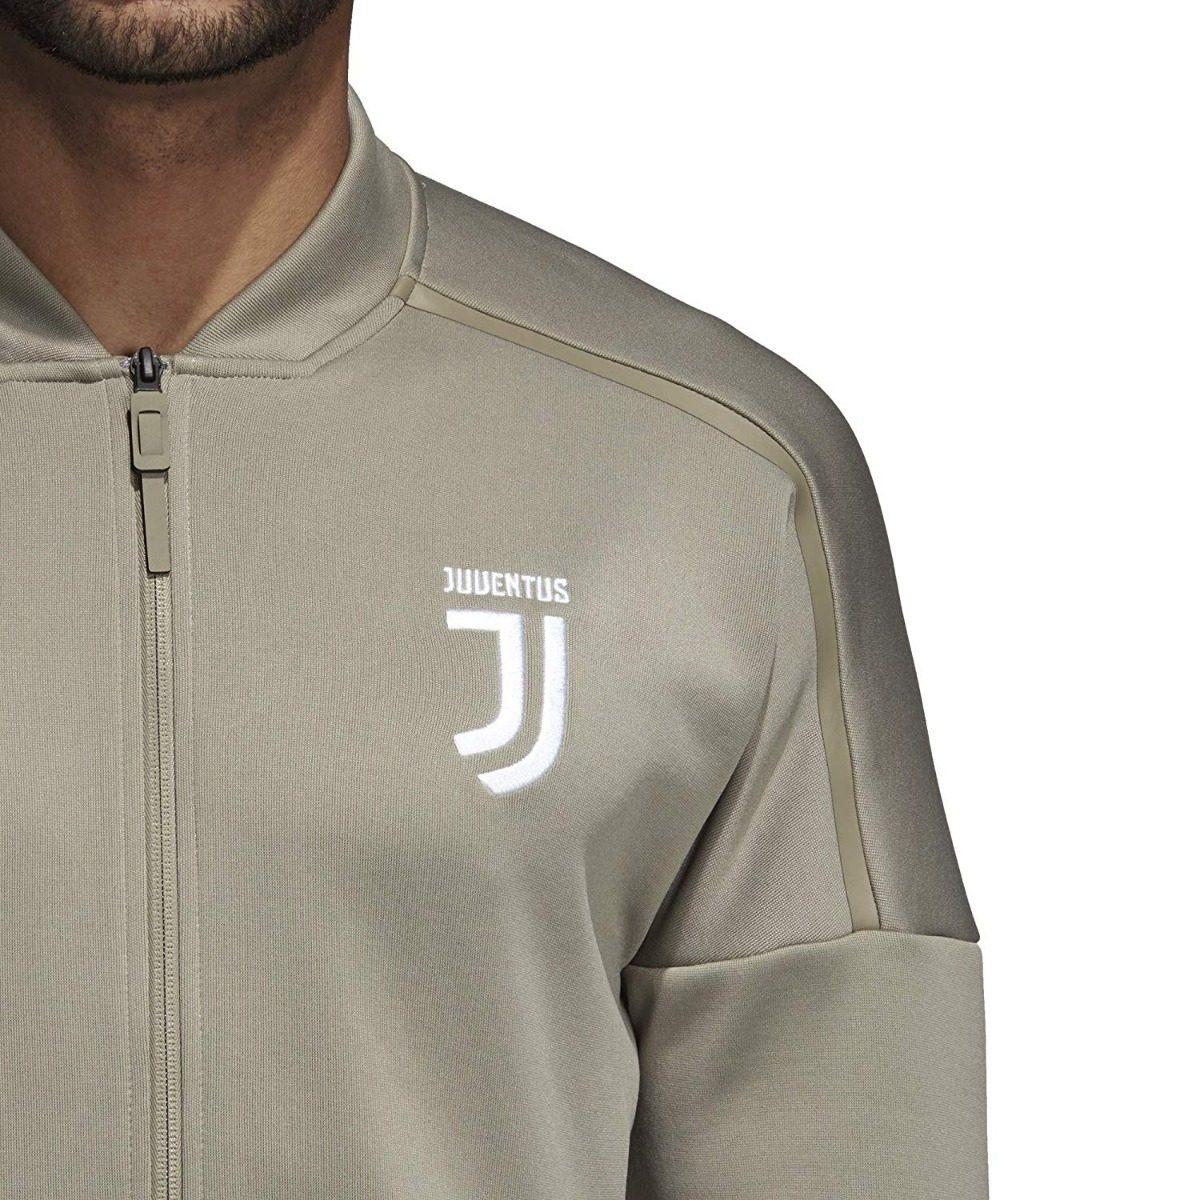 32e1983237 2018 2019 juventus adidas zone anthem jacket clay